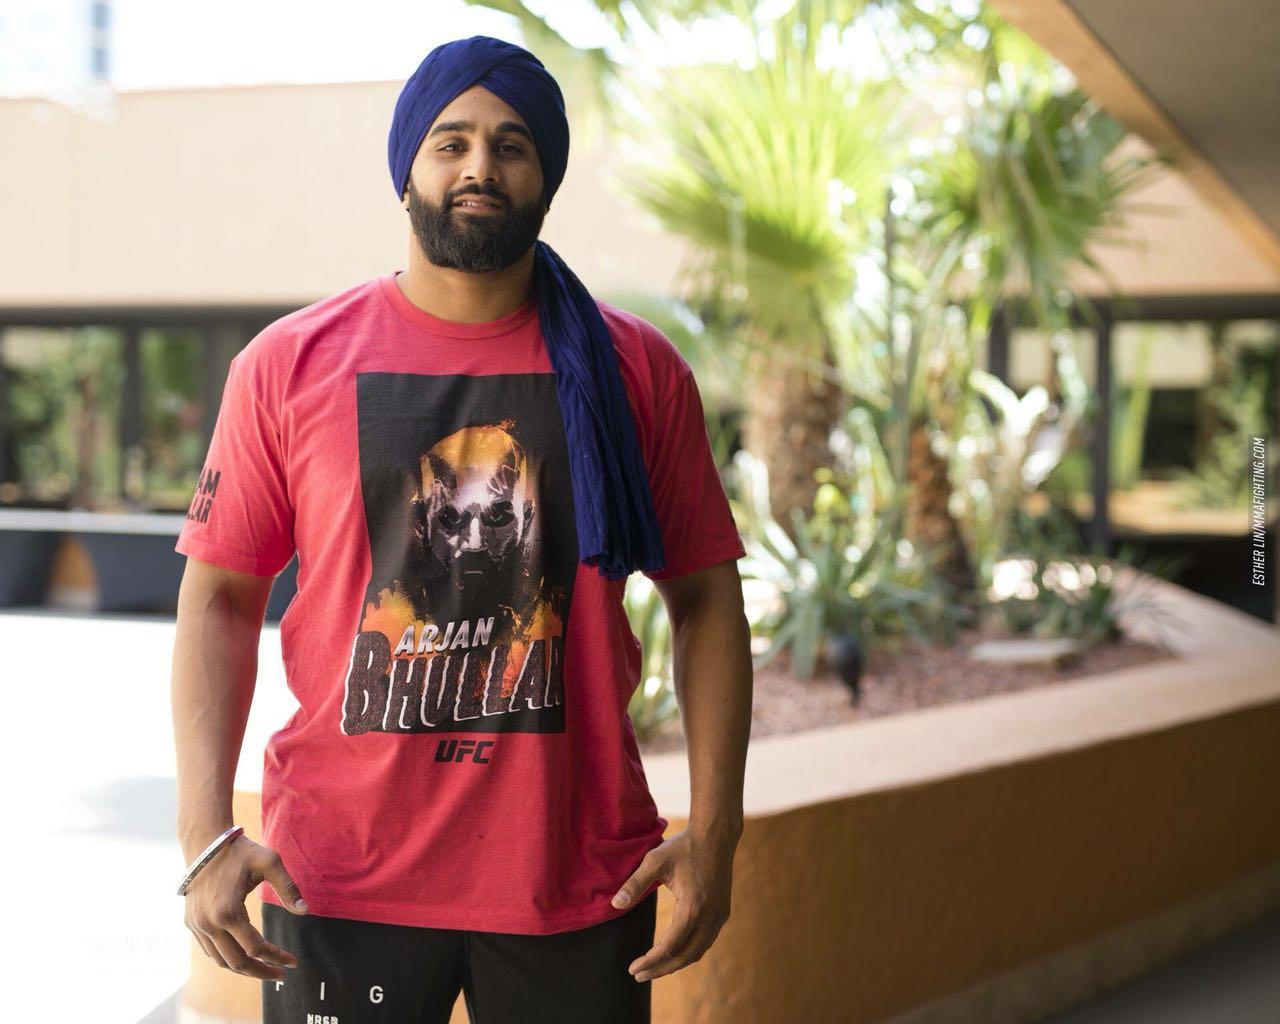 MMA India Exclusive: Thanks to Arjan Singh bhullar, 'The Pagdi' reaches the Octagon on Vaisakhi - Arjan Singh Bhullar